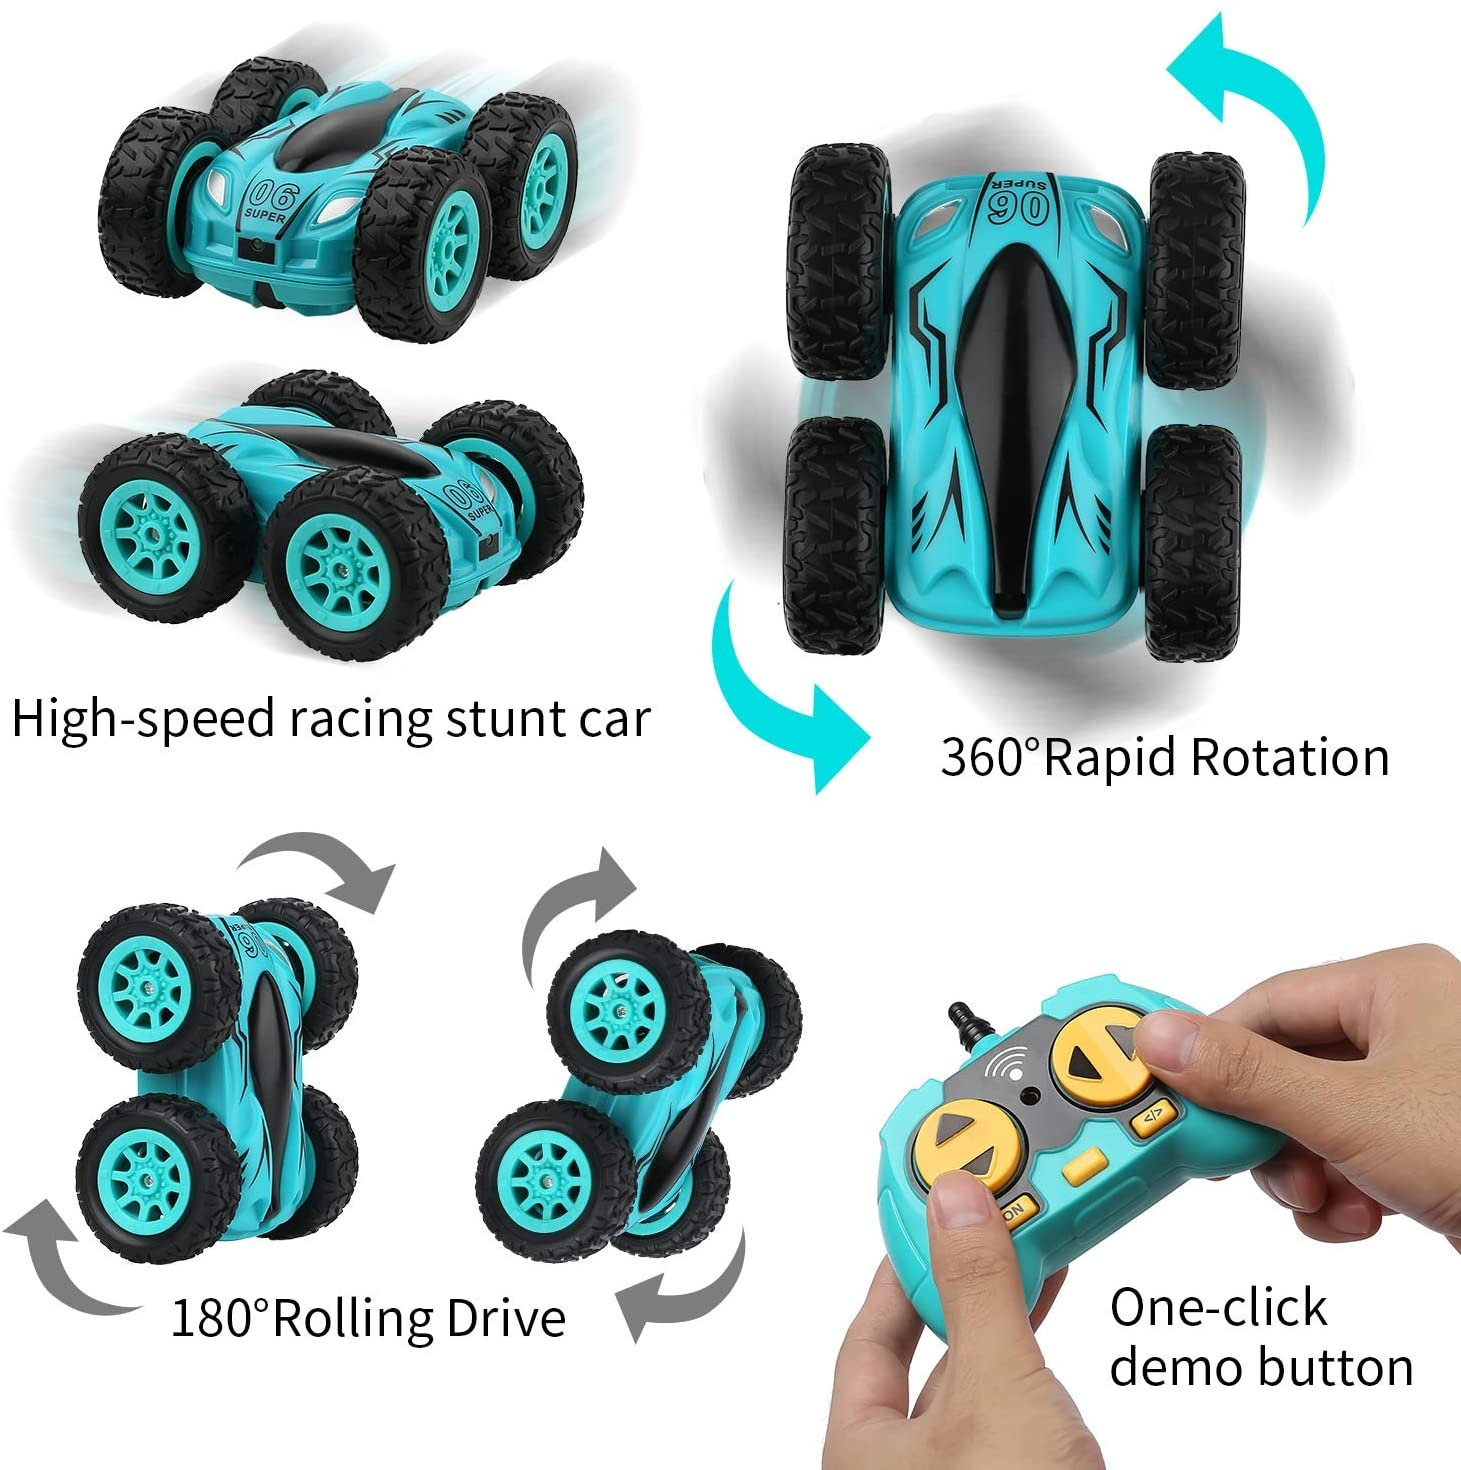 3.7 Inch Rc Auto 2.4G 4CH Dubbelzijdig Bounce Drift Stunt Auto Rock Crawler Roll Auto 360 Graden flip Afstandsbediening Auto Kinderen Speelgoed 2